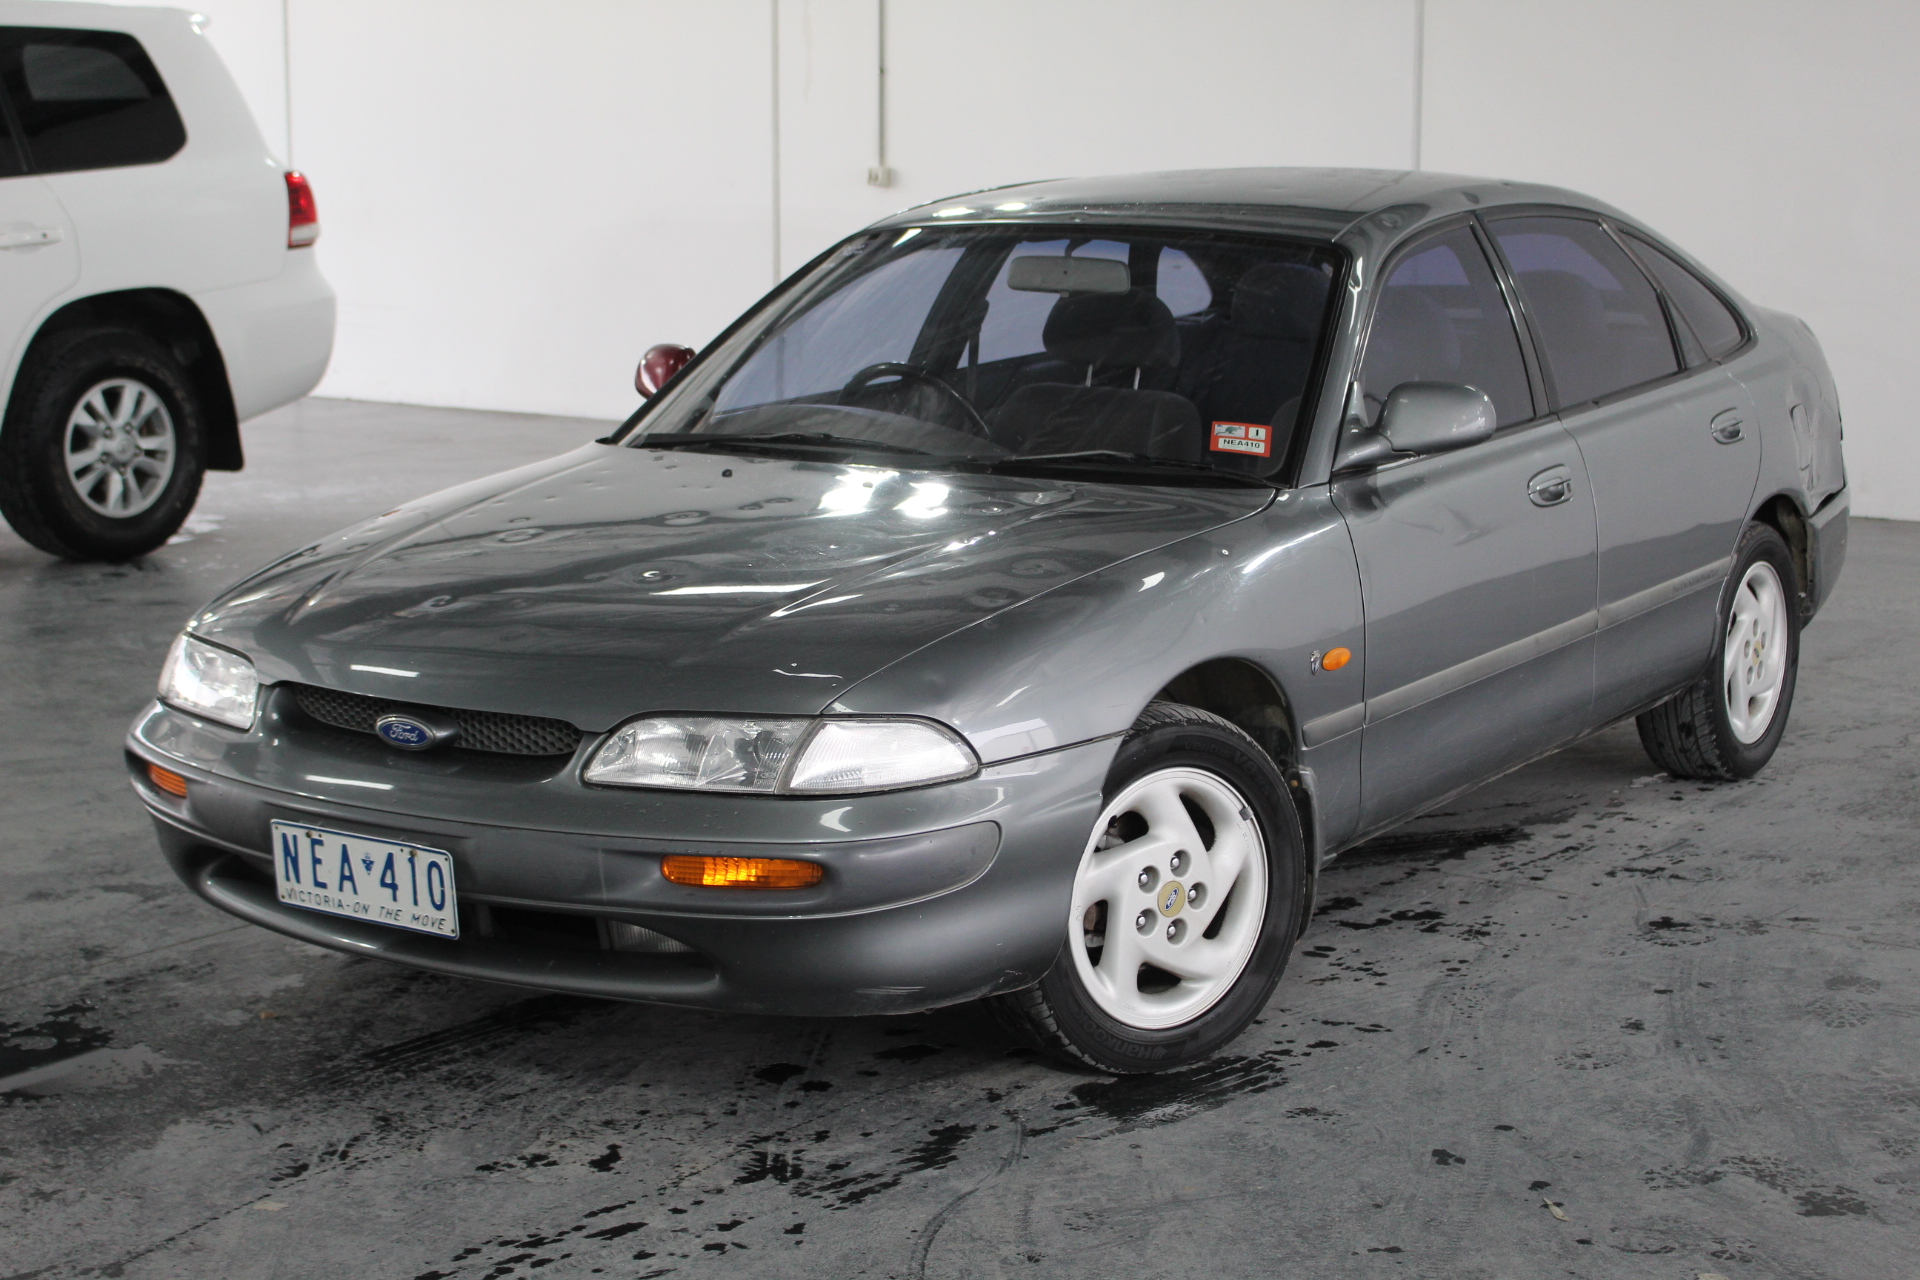 1993 Ford TELSTAR TX5 GHIA V6 AY Automatic Hatchback Auction (0001-3428426)  | GraysOnline Australia